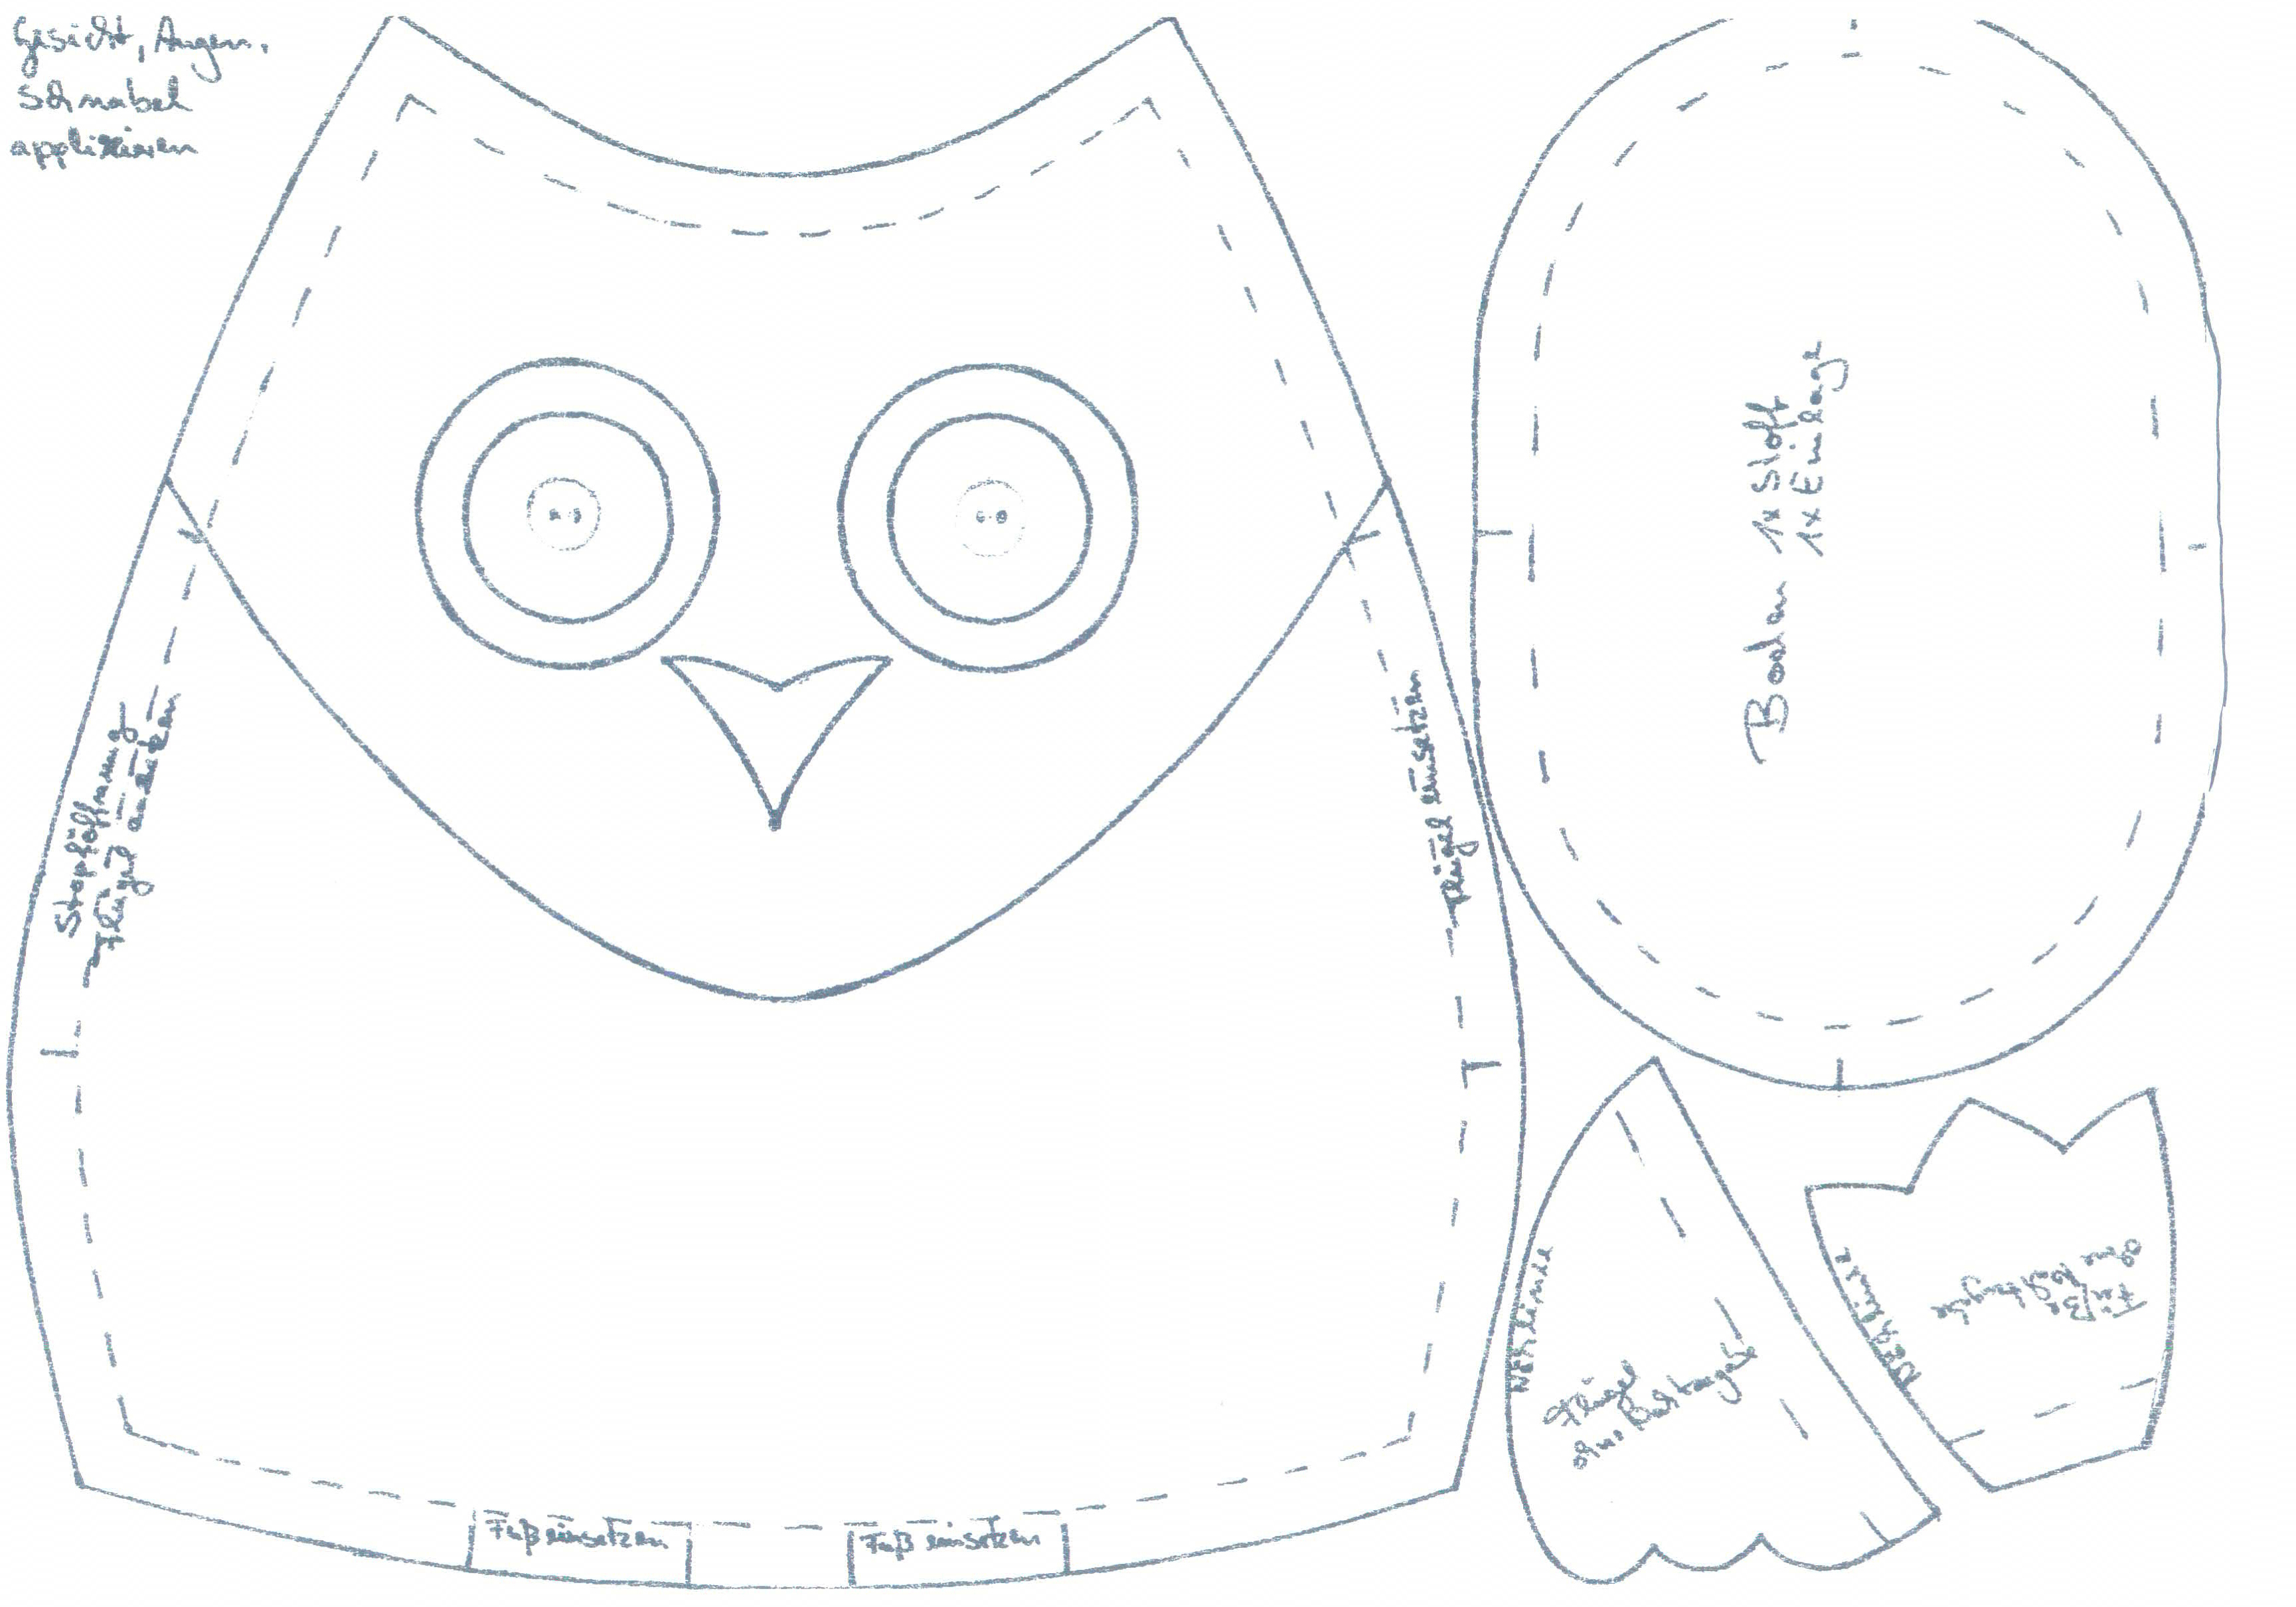 Mathilda-Dekoeulen zum Nachnähen | Nähen | Kreativ-Blog | Stoffe ...